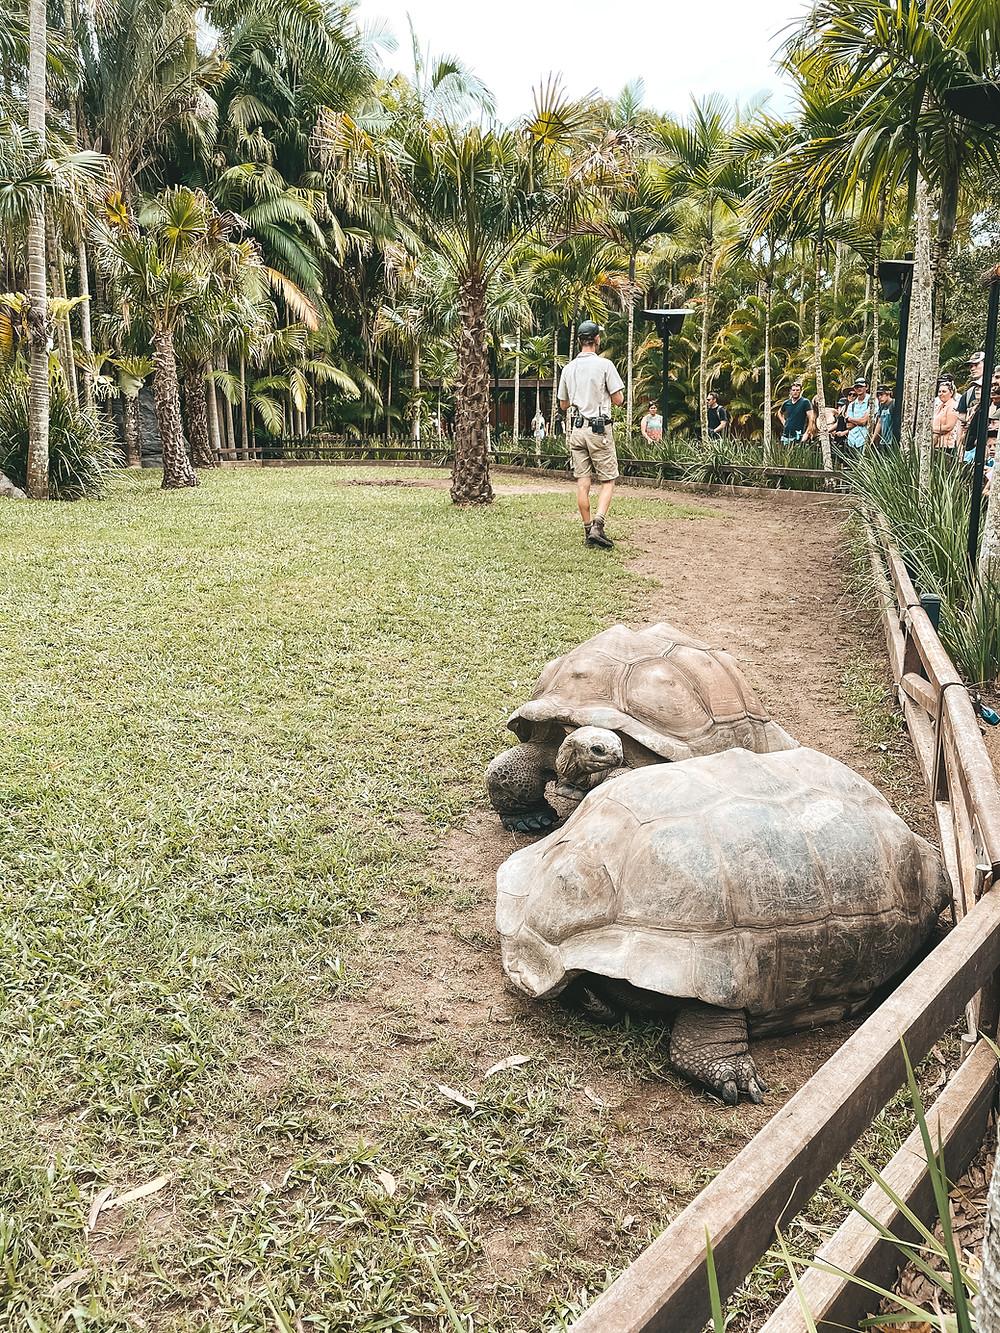 Aldabra Tortoise Feeding Show, Australia Zoo